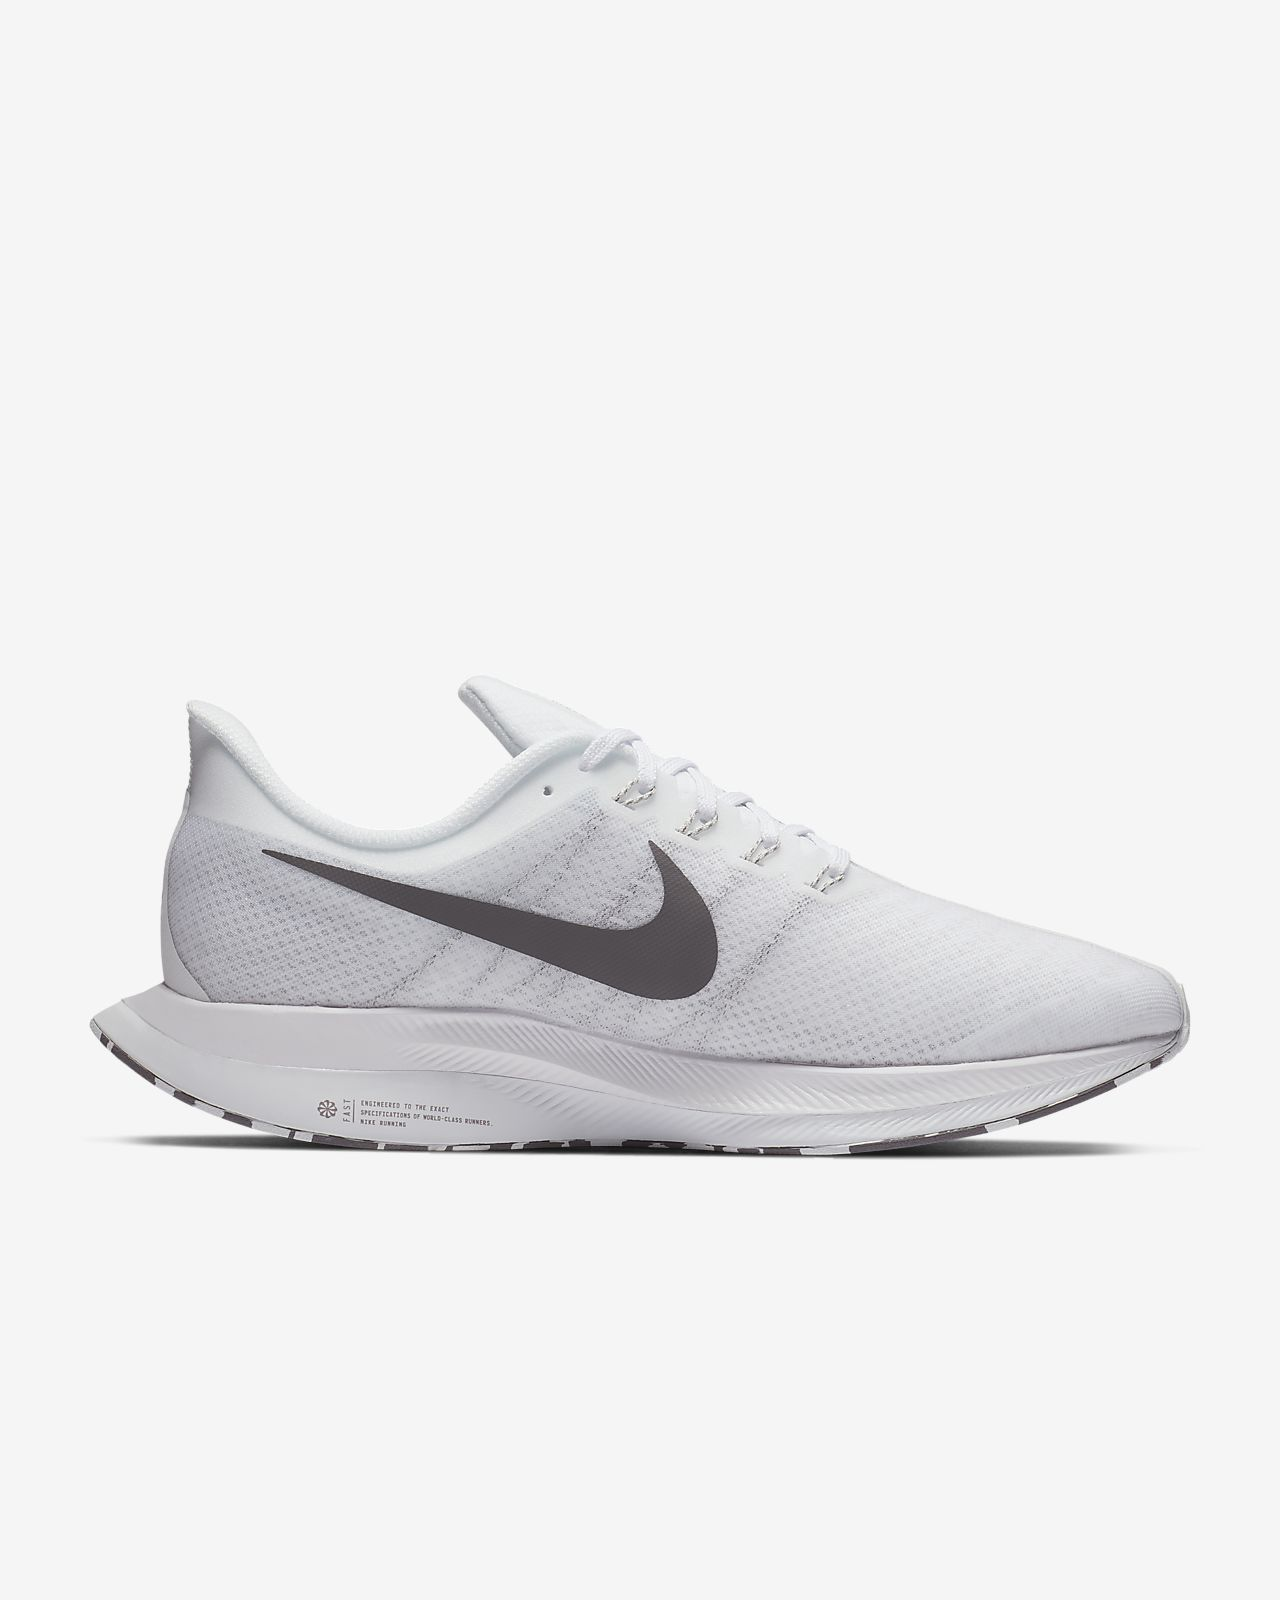 0ce83d359c917 Low Resolution Nike Zoom Pegasus Turbo Men s Running Shoe Nike Zoom Pegasus  Turbo Men s Running Shoe